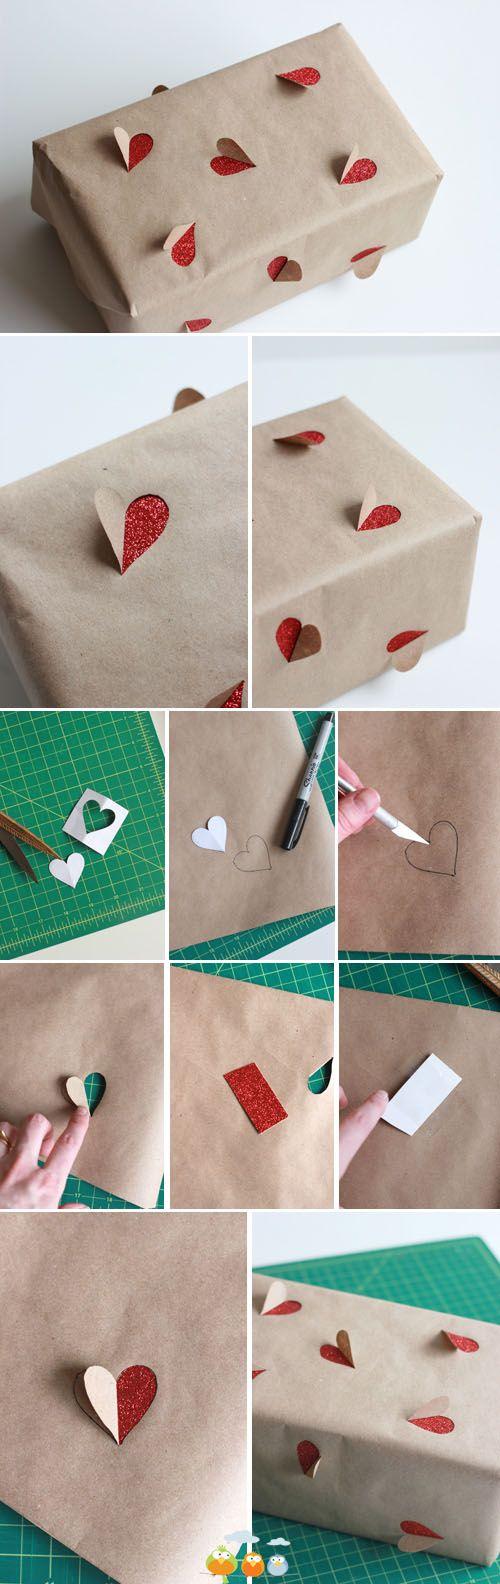 DIY heart gift wrap